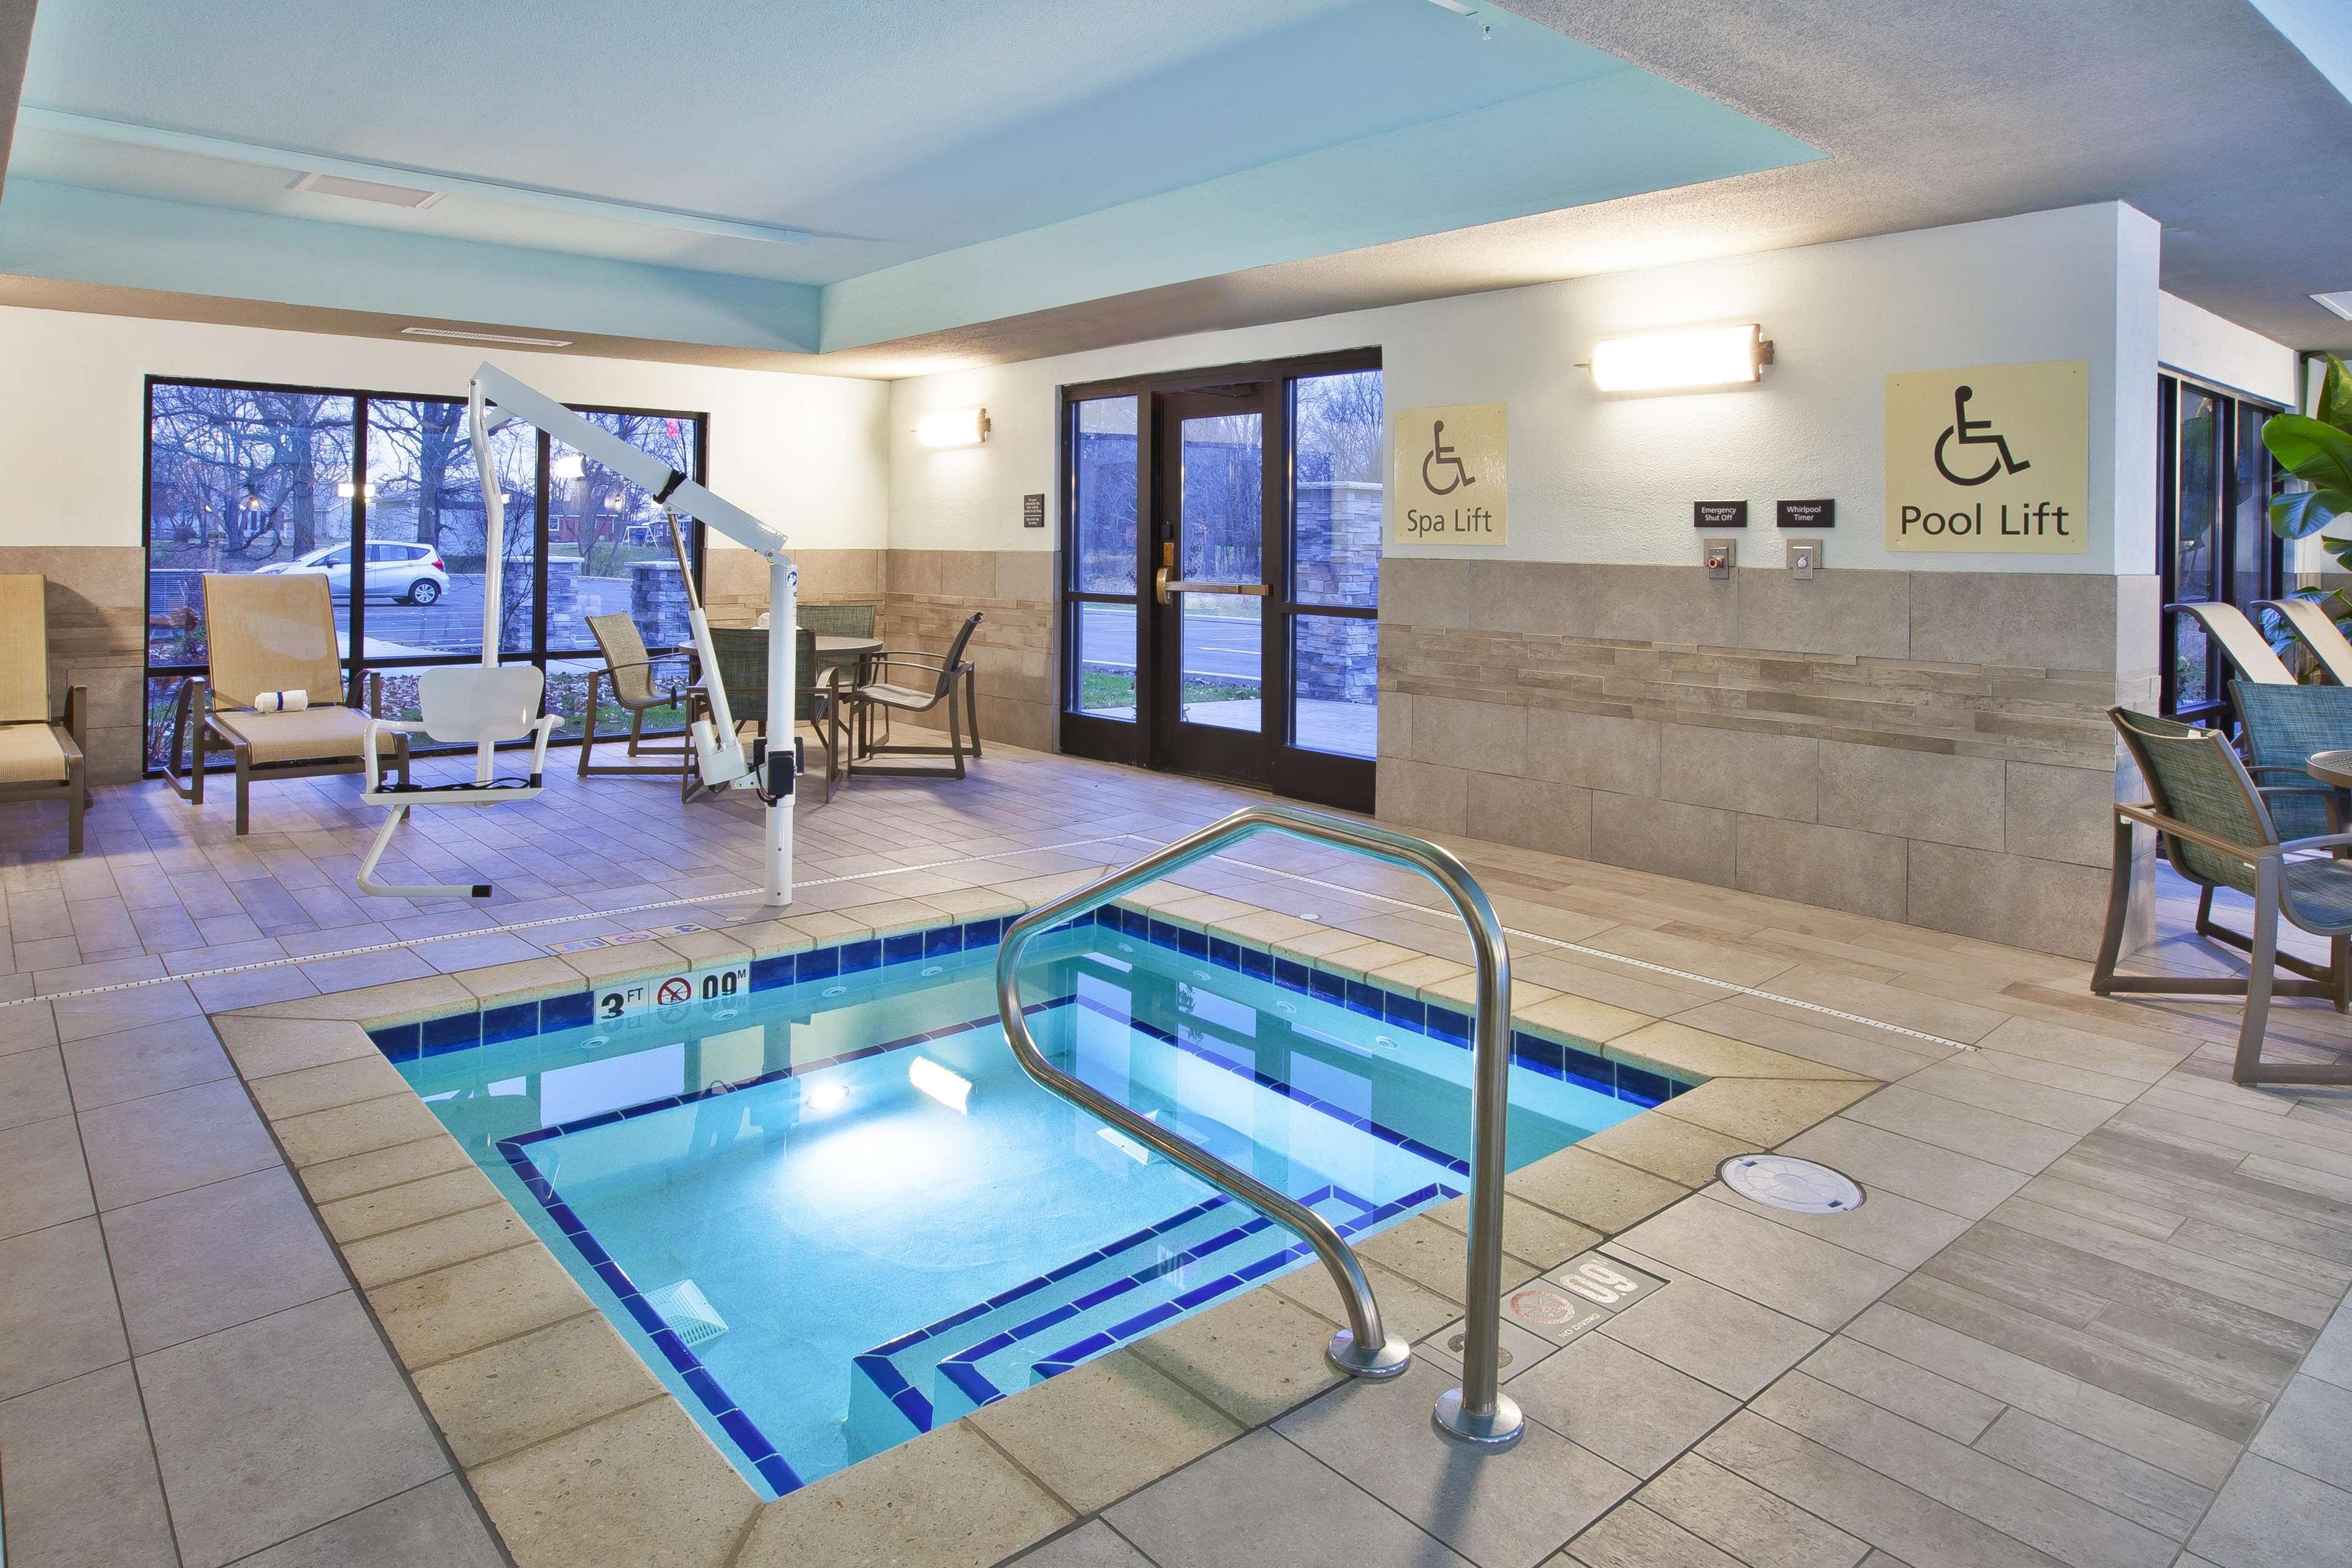 Hampton Inn & Suites Alliance image 20